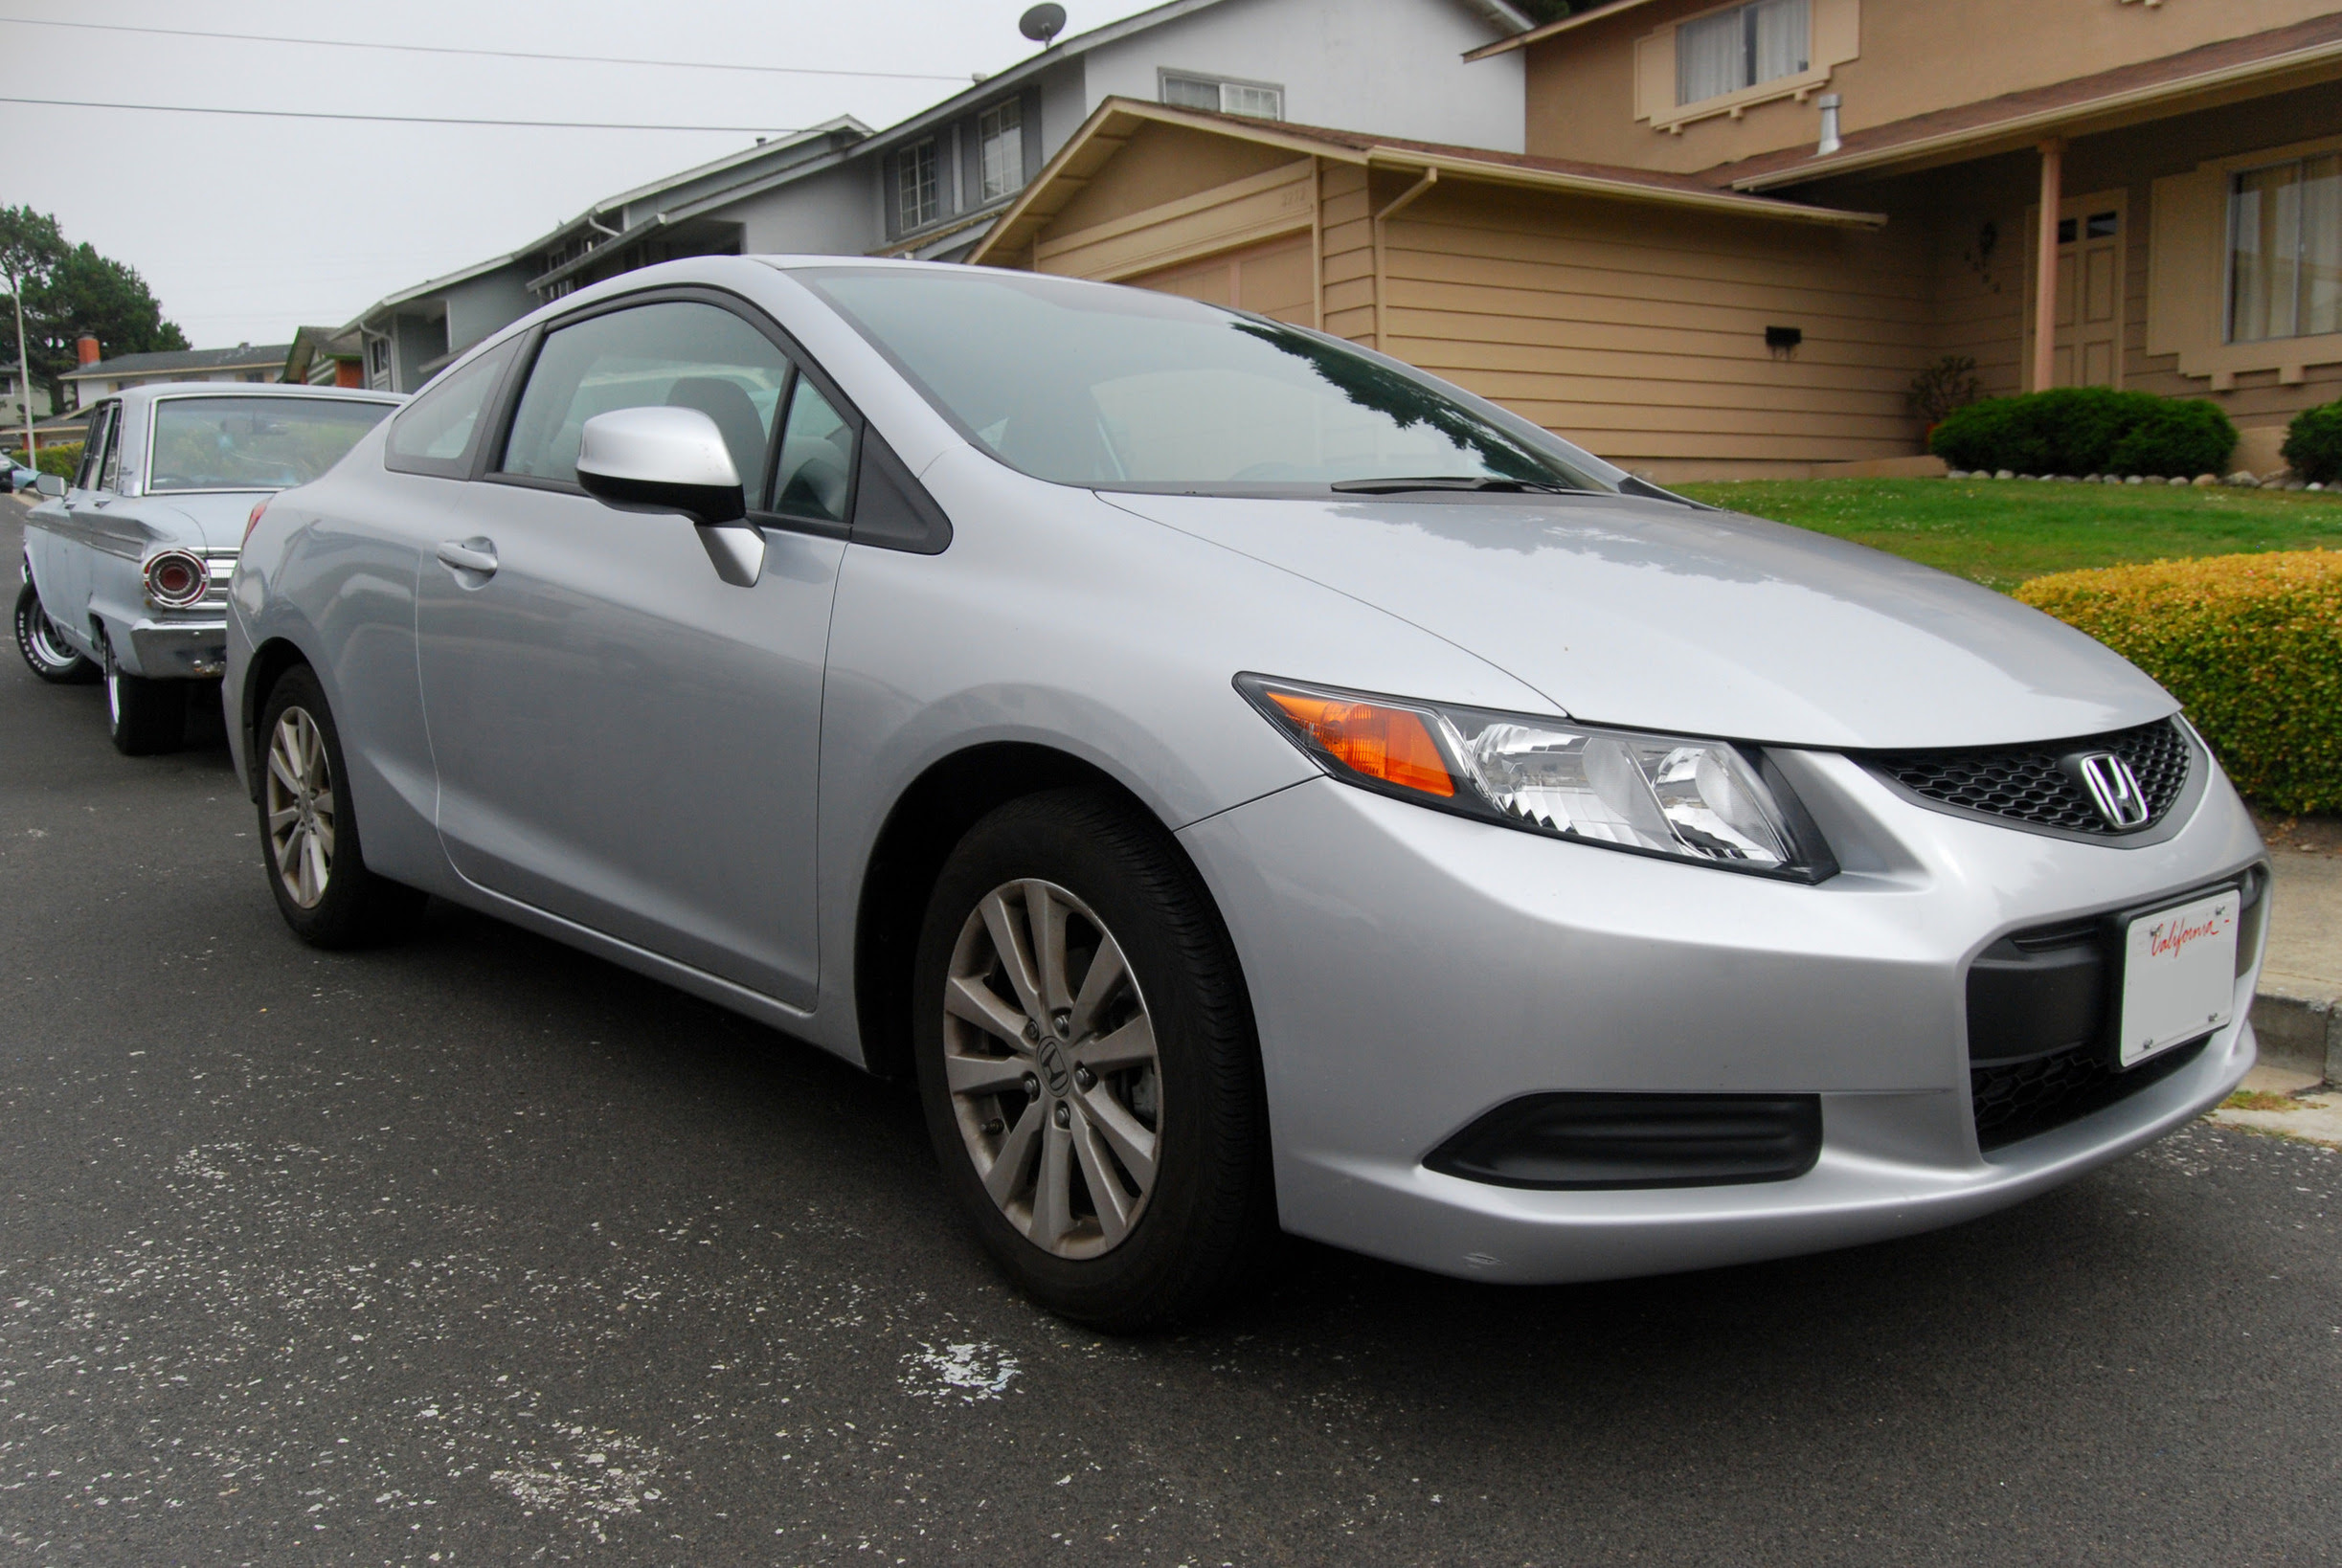 Review: 2012 Honda Civic EX-L Coupe